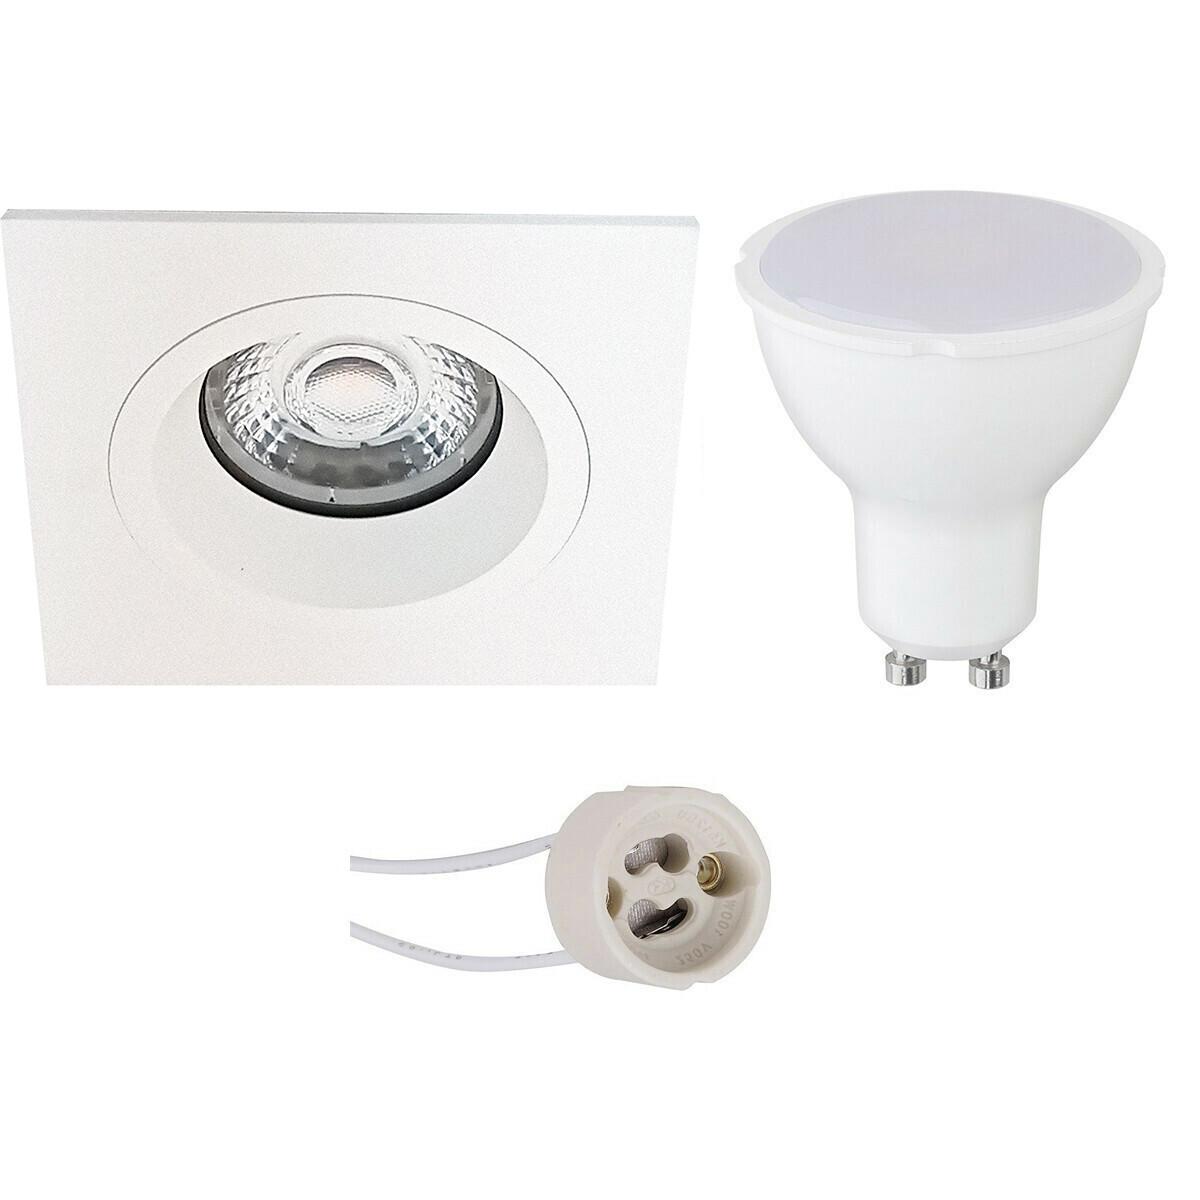 LED Spot Set - Aigi - Pragmi Rodos Pro - GU10 Fitting - Inbouw Vierkant - Mat Wit - 6W - Warm Wit 30